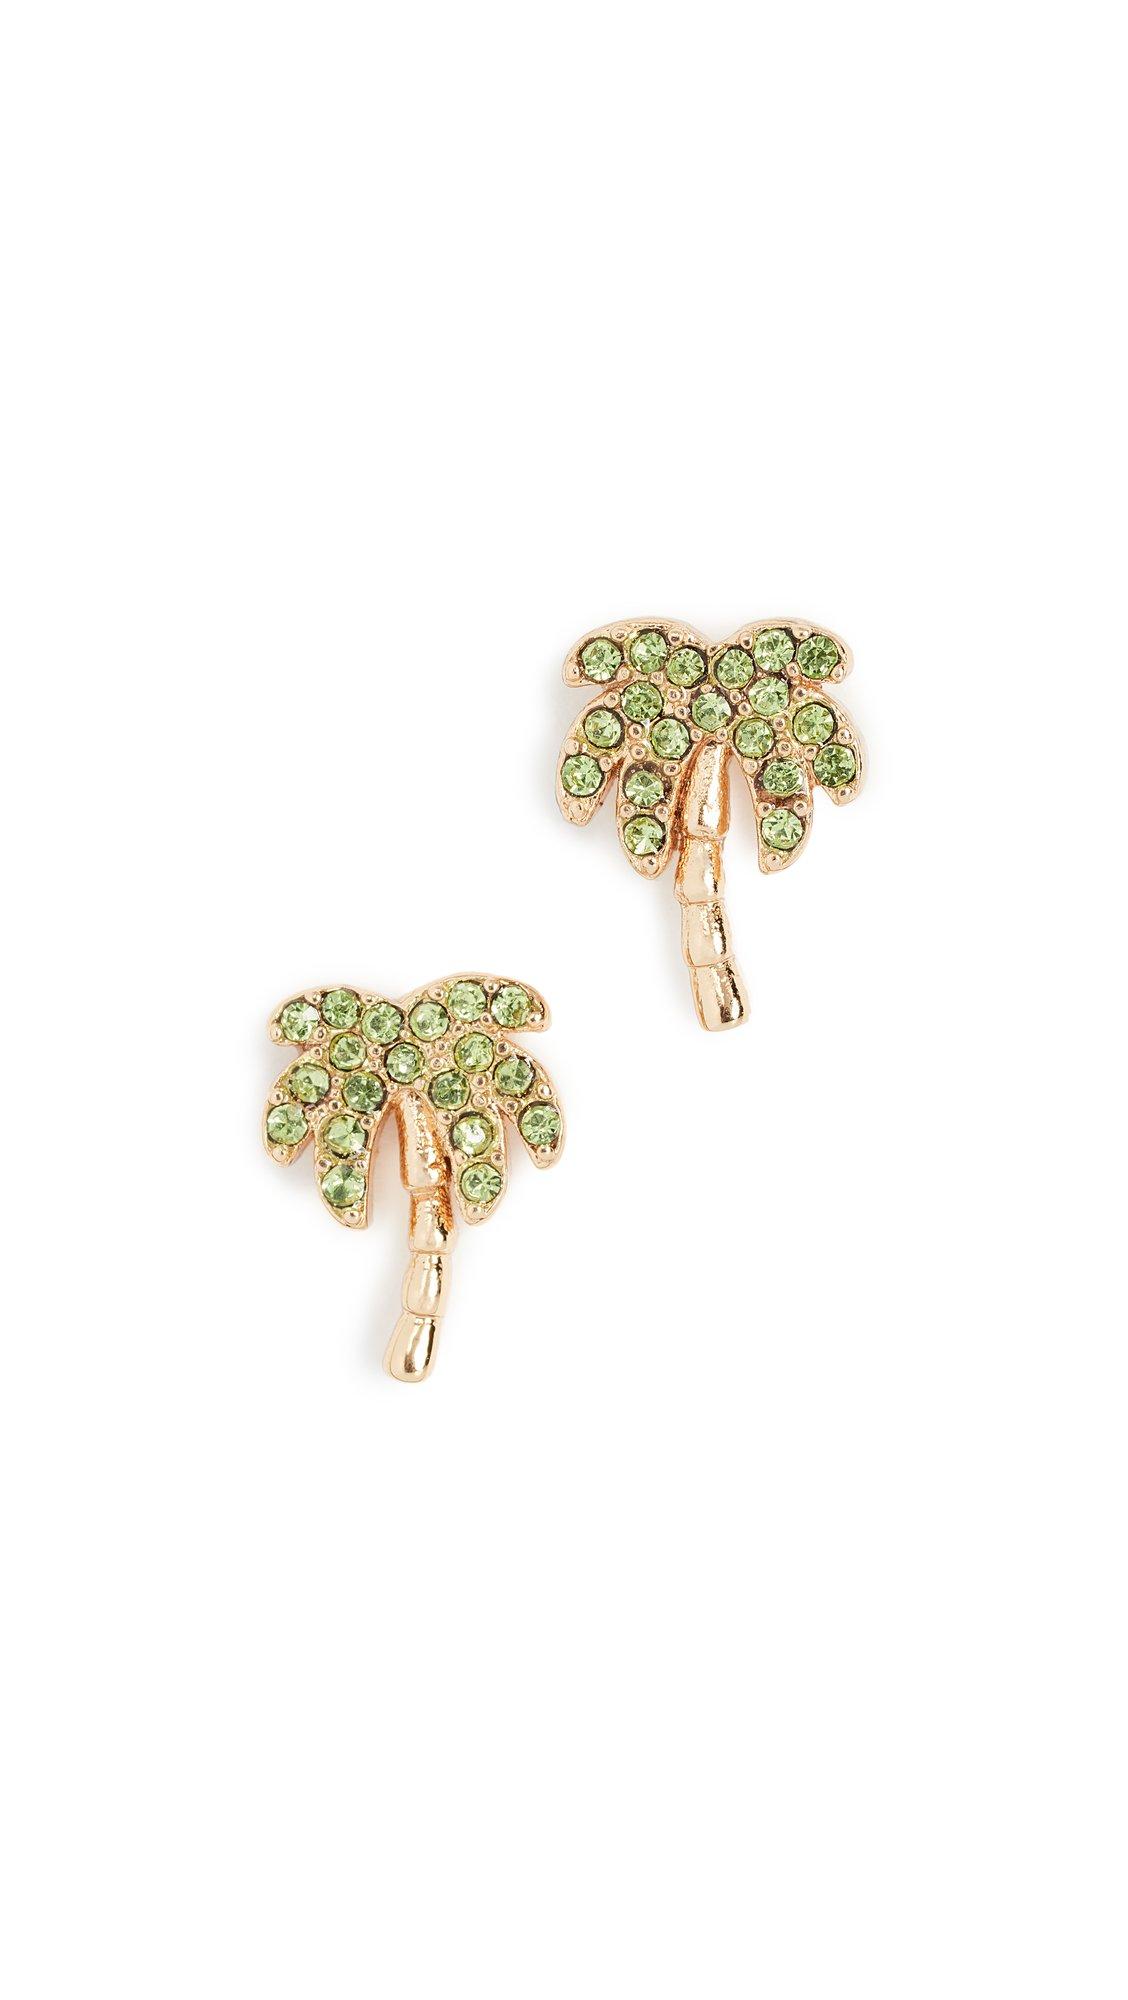 kate spade new york Womens Pave Palm Tree Stud Earrings, Multi